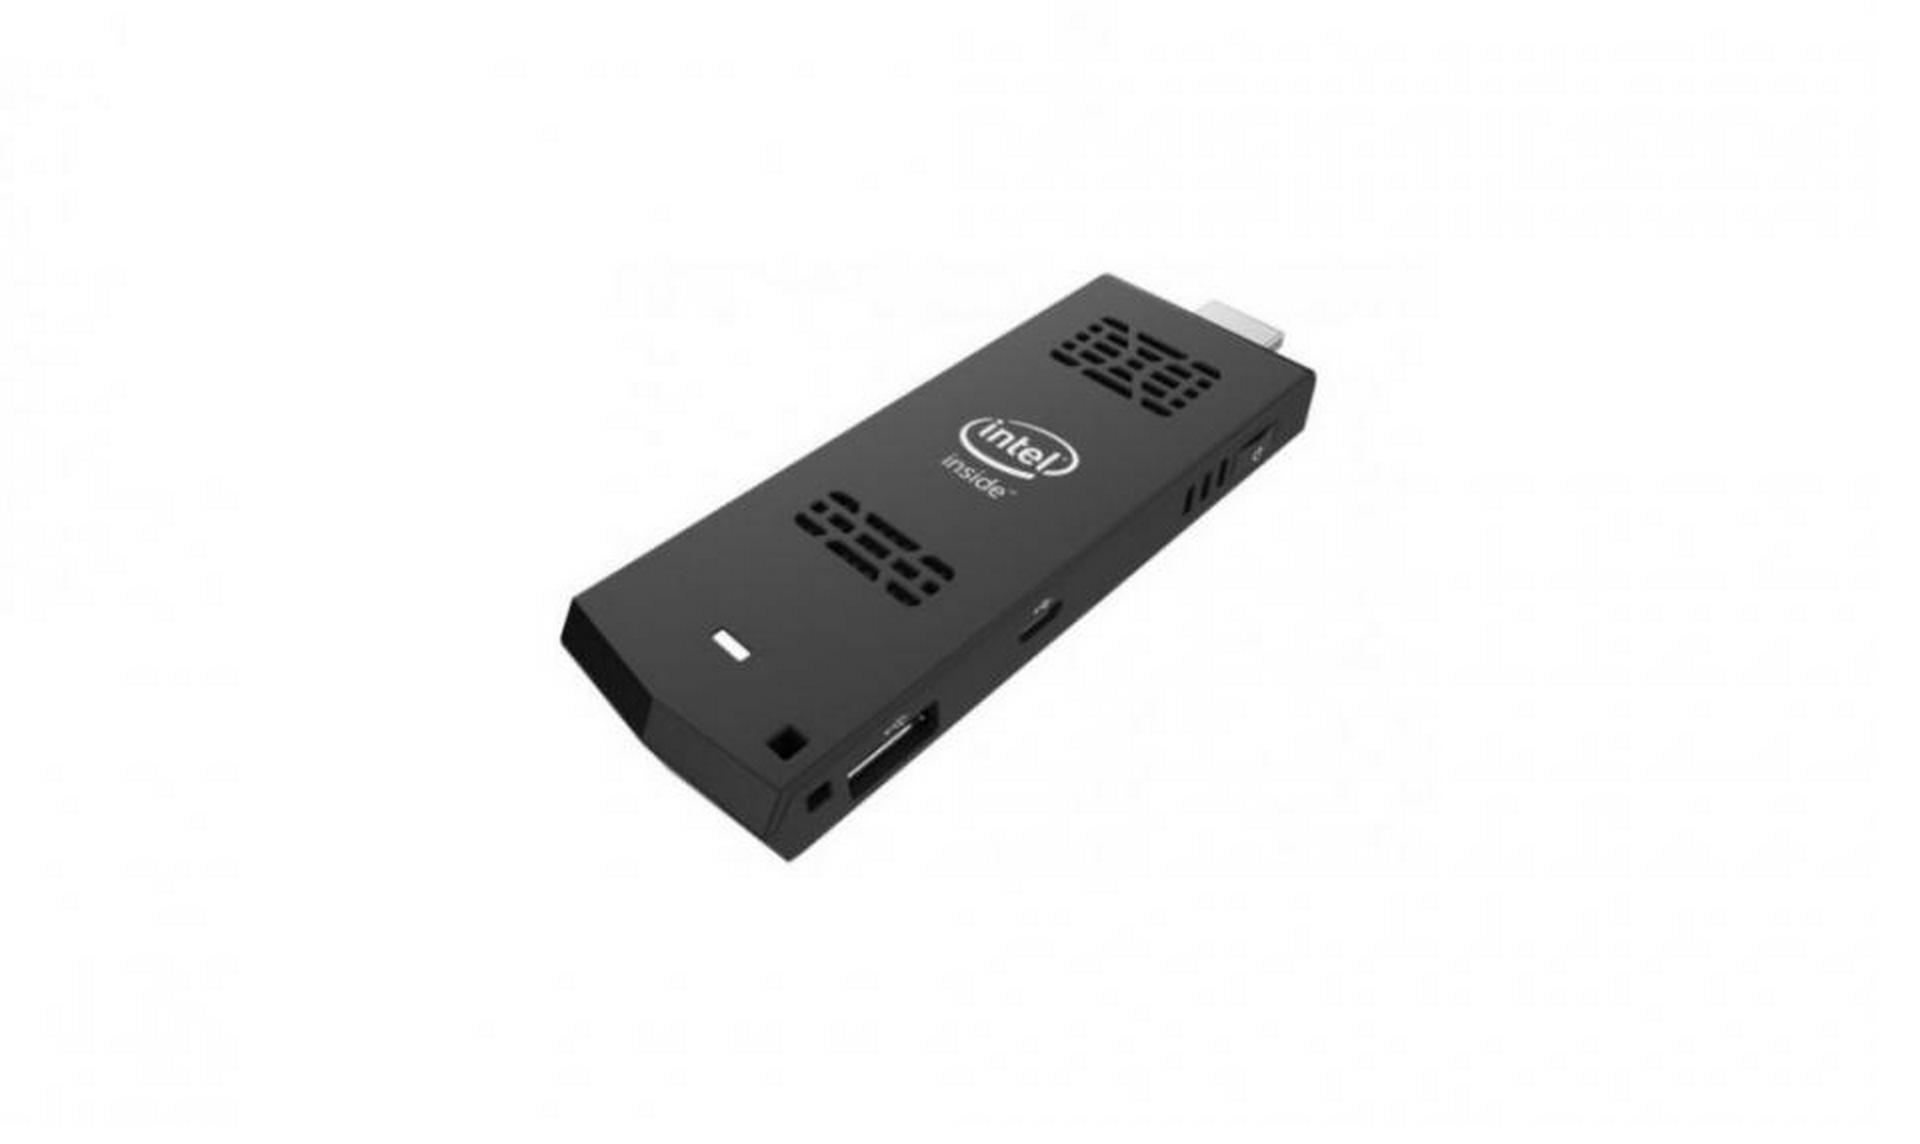 Intel Stick